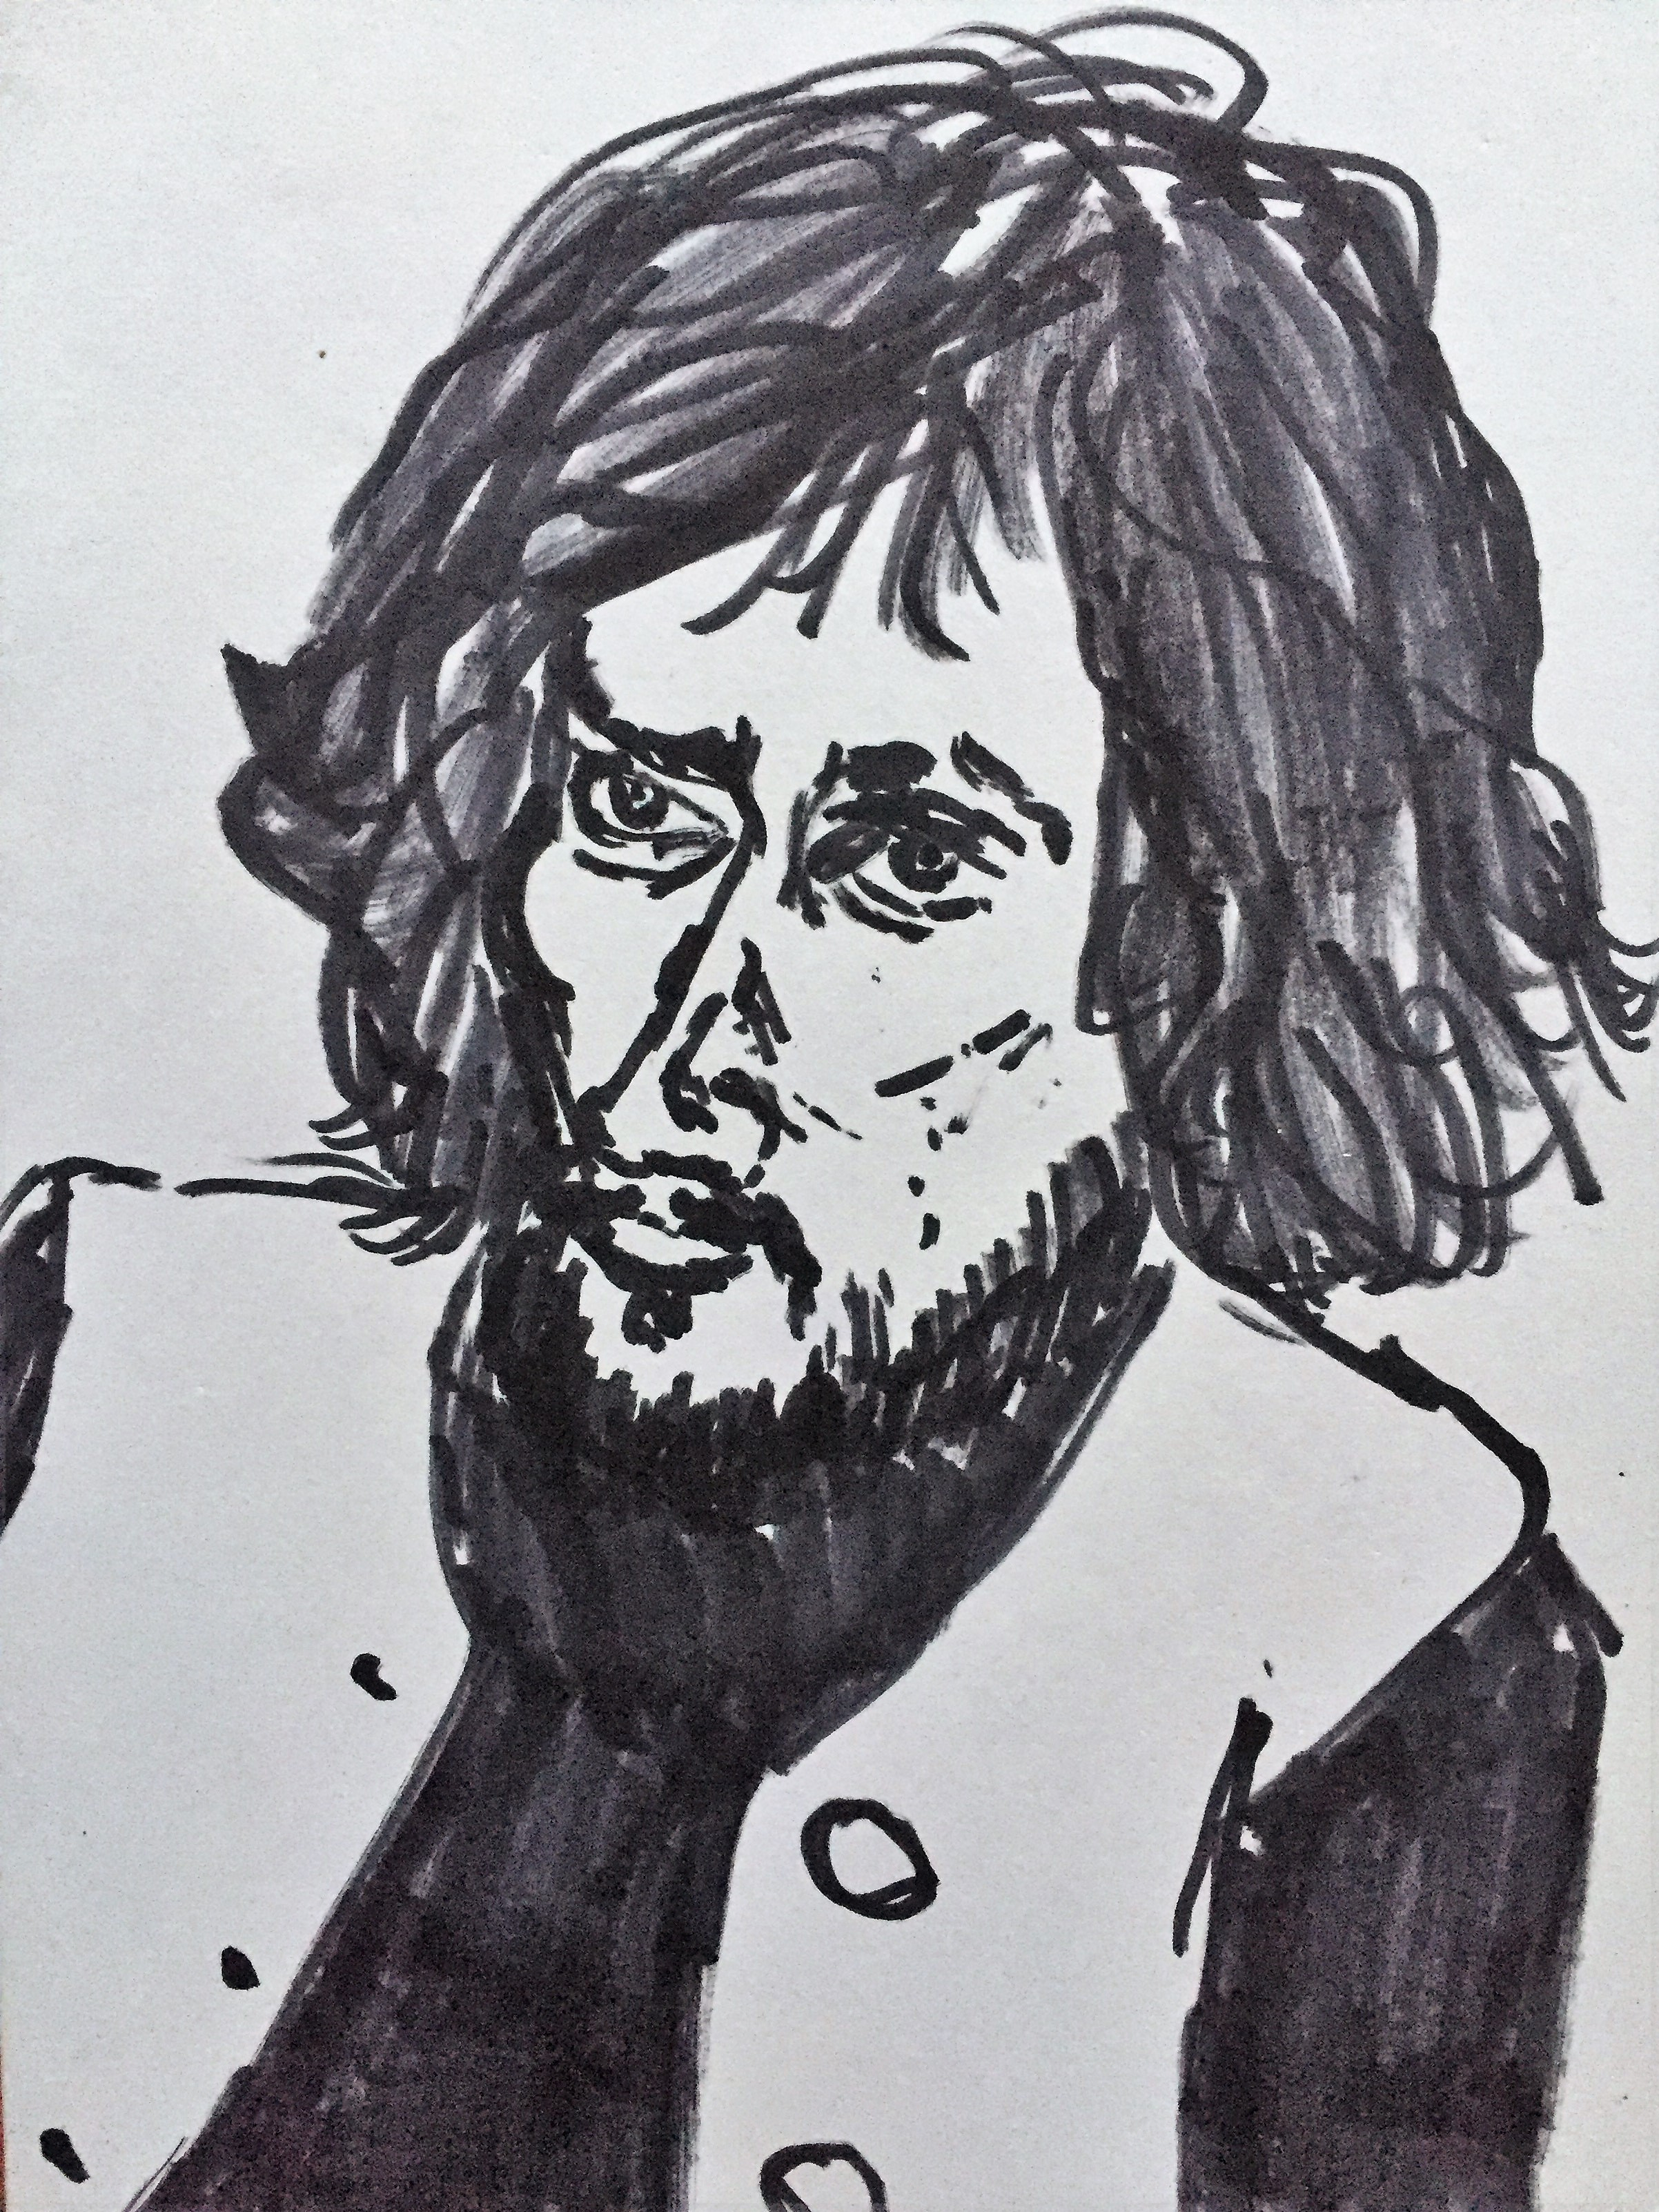 Westenträger 1975